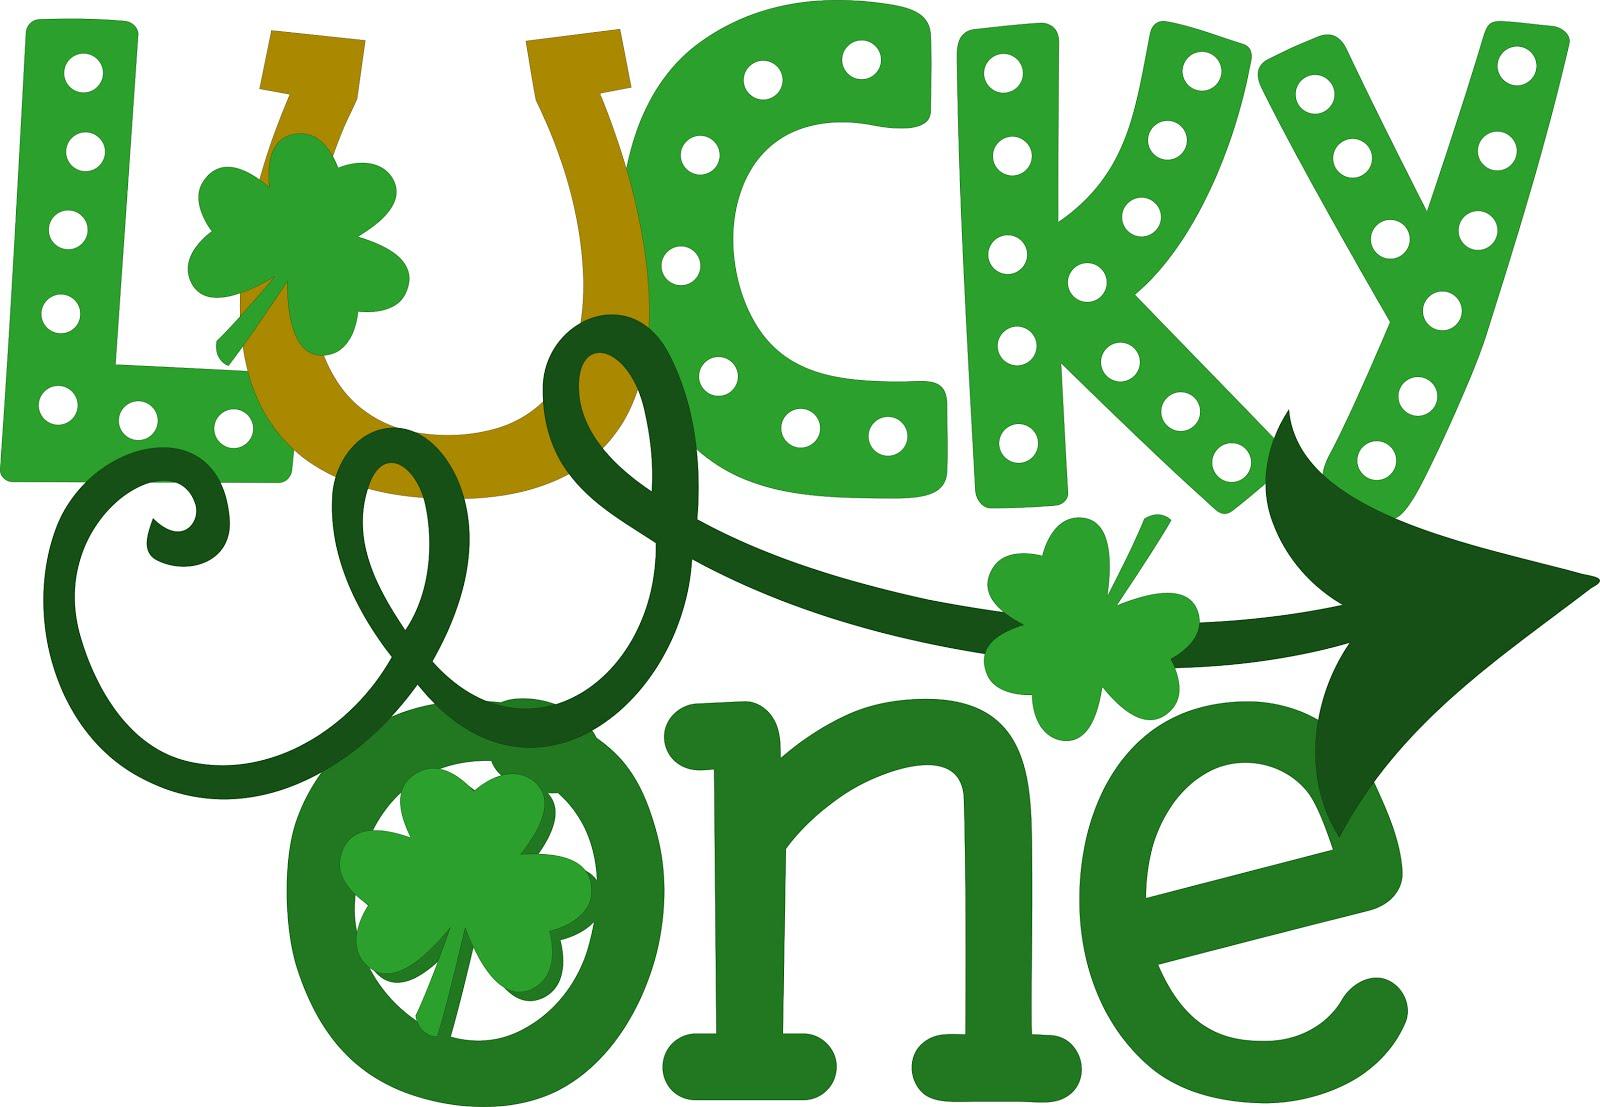 1600x1107 Free St. Patrick's Day Silhouette Design File